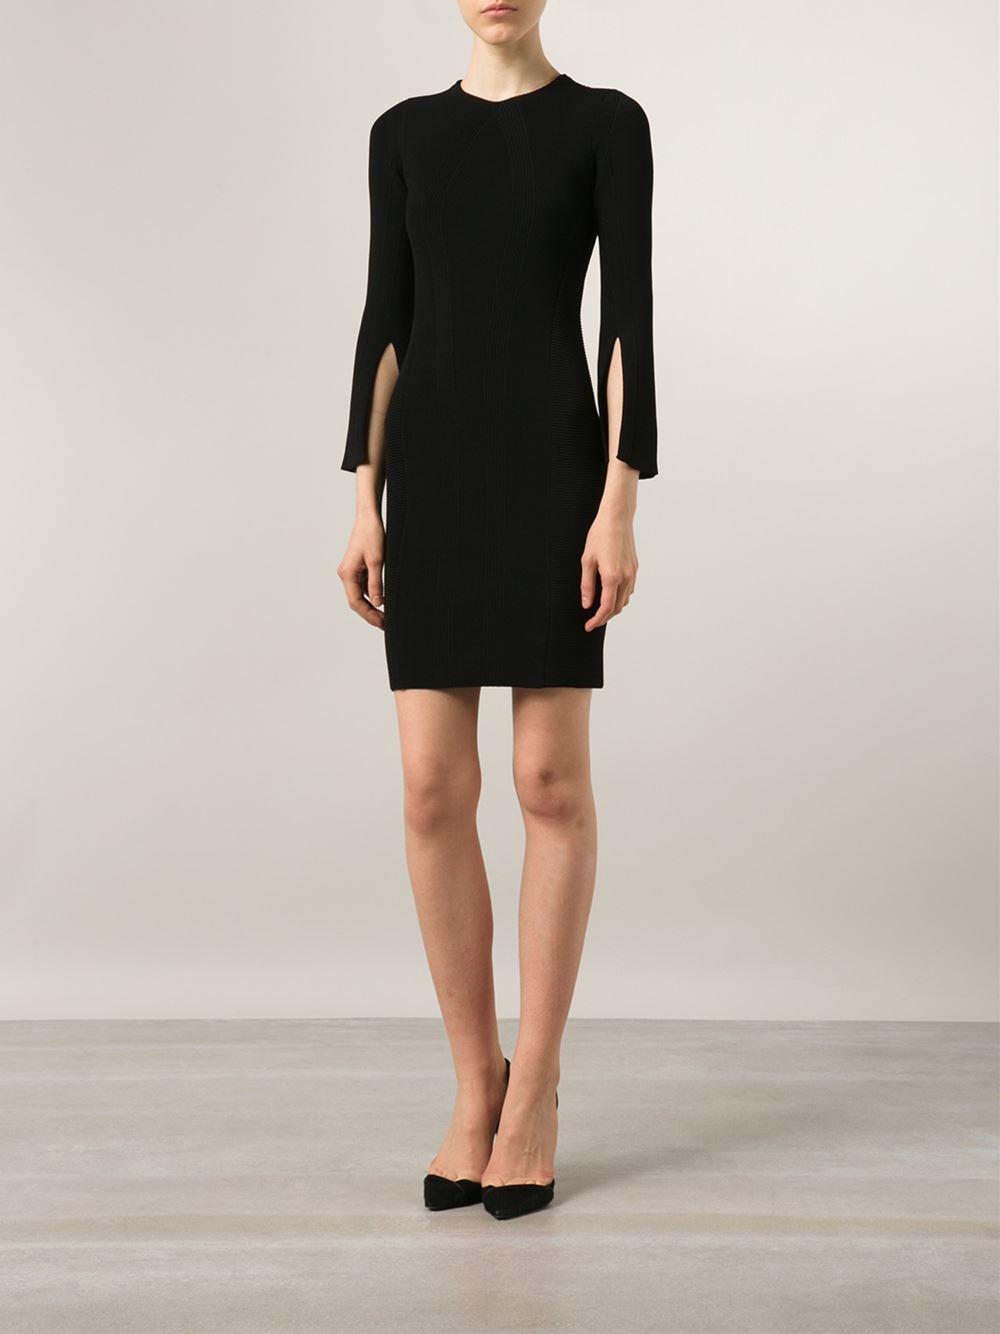 Black bodycon dress with slit spring fashion